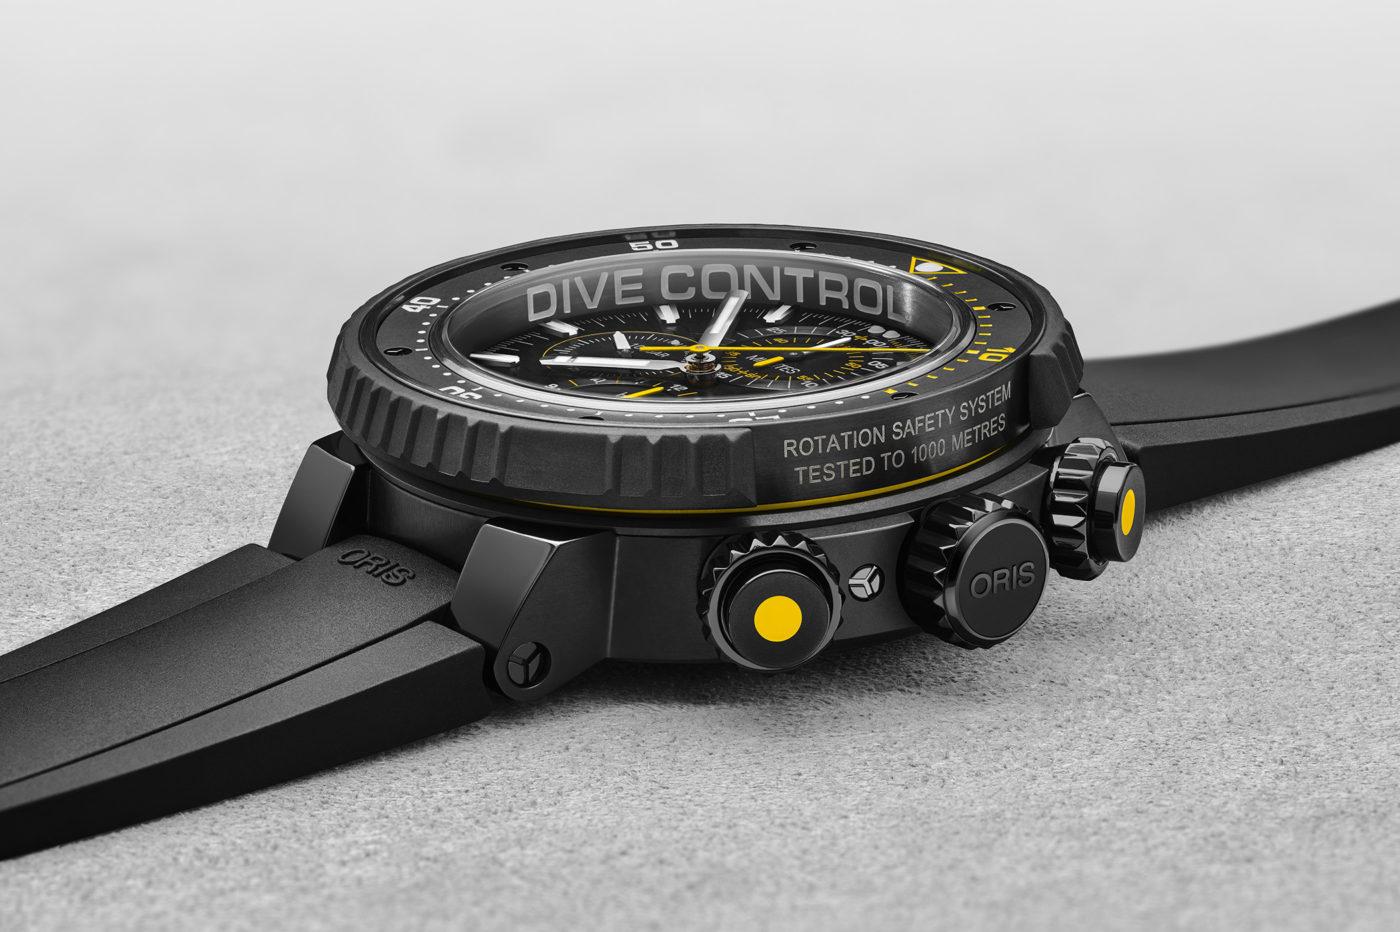 Oris ProDiver Dive Control Limited Edition [dostępność, cena]